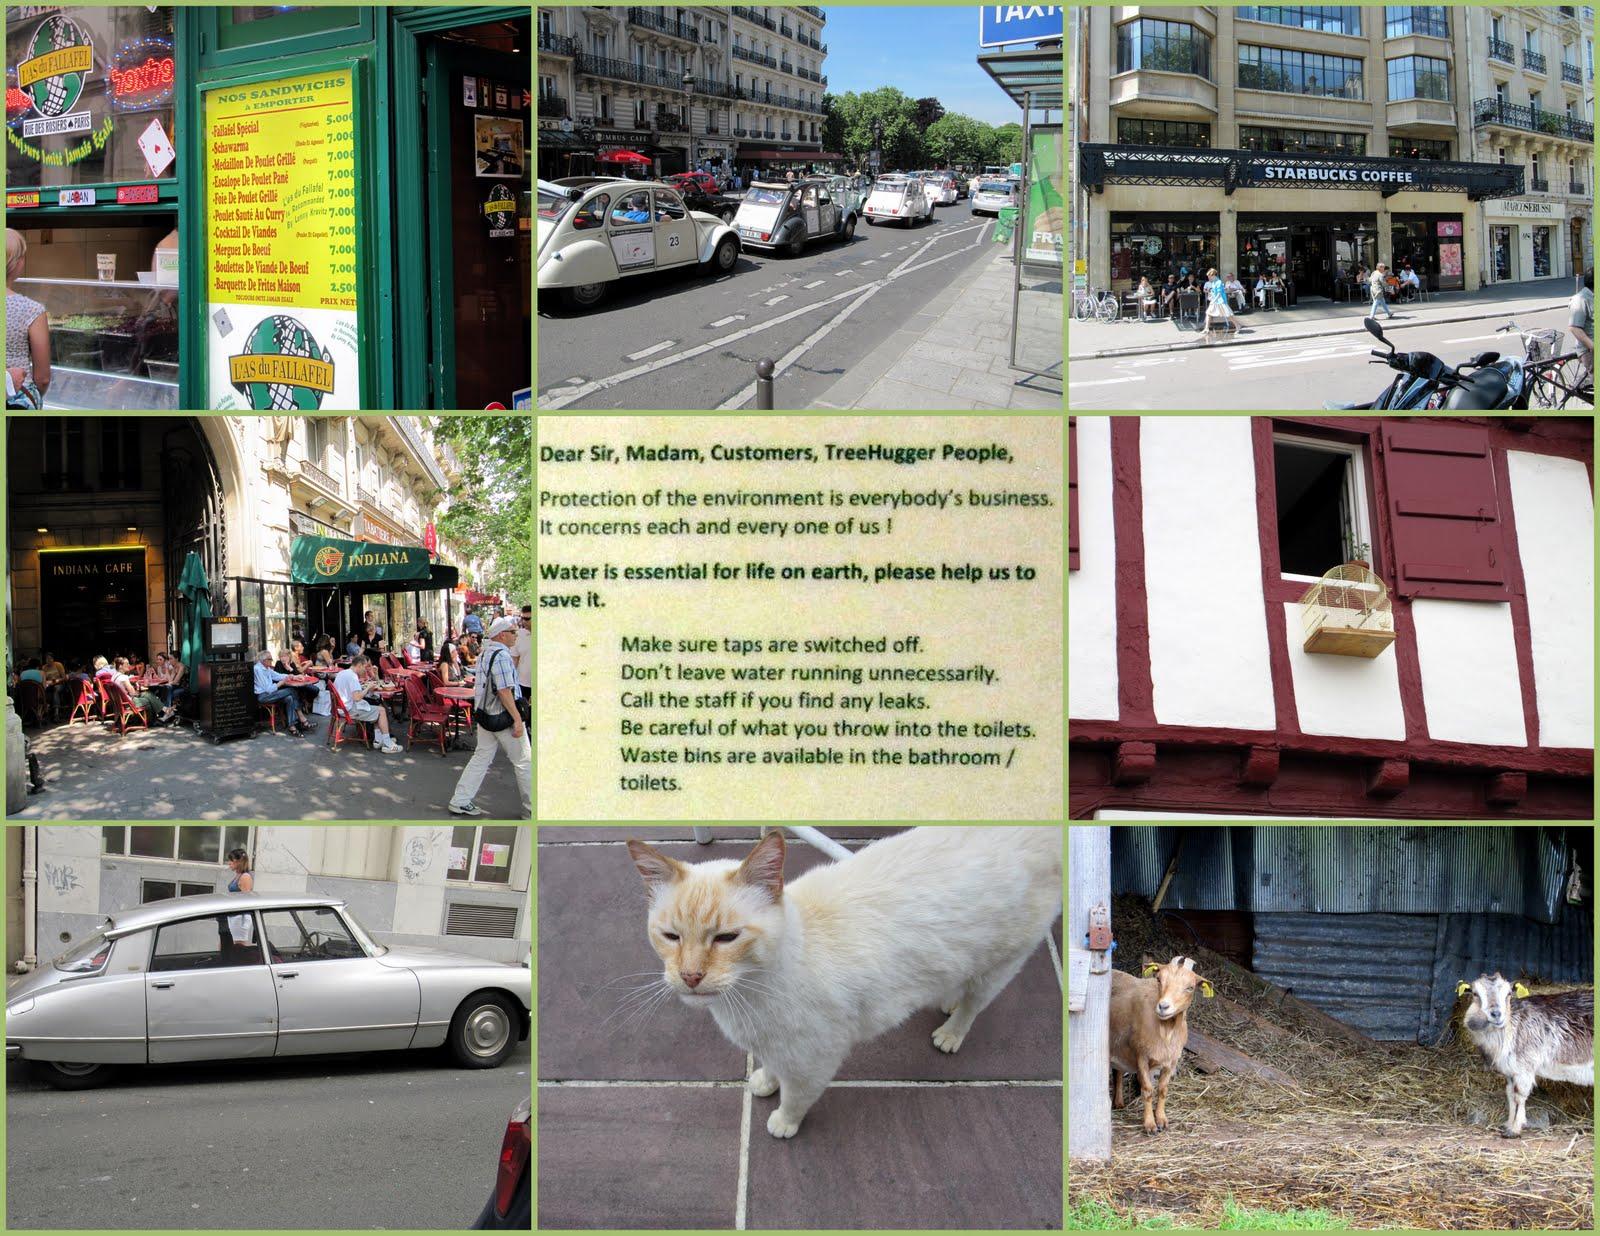 http://4.bp.blogspot.com/_NPacLTEgTKc/TBGnISsb8PI/AAAAAAAAEXc/XGphKV-GAF8/s1600/2010_France_Fun_Photos2.jpg